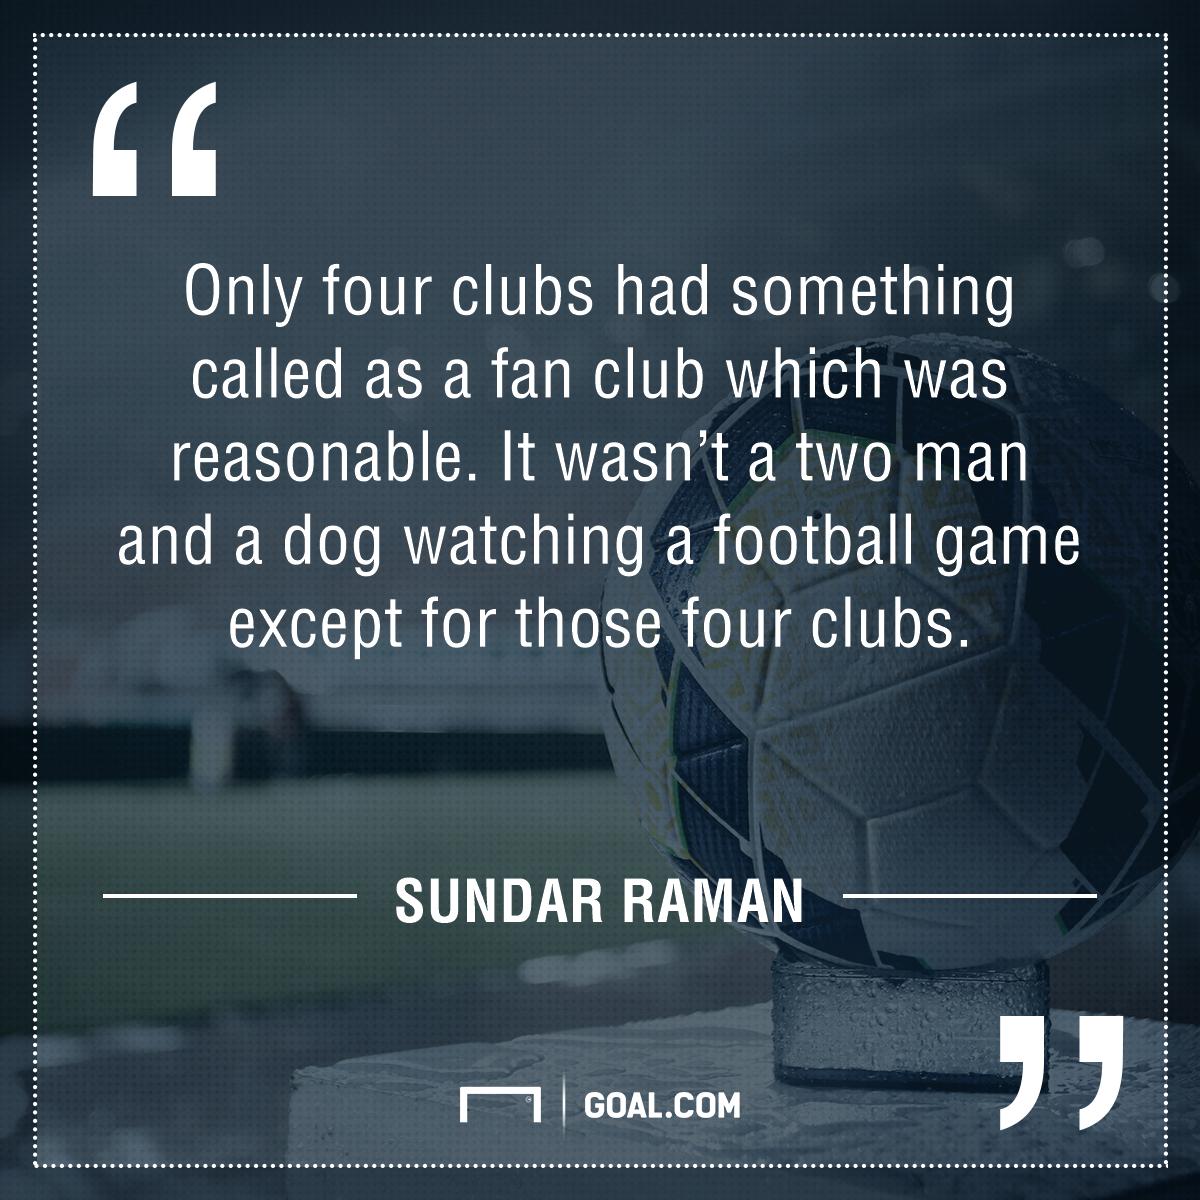 Sundar Raman on fan base